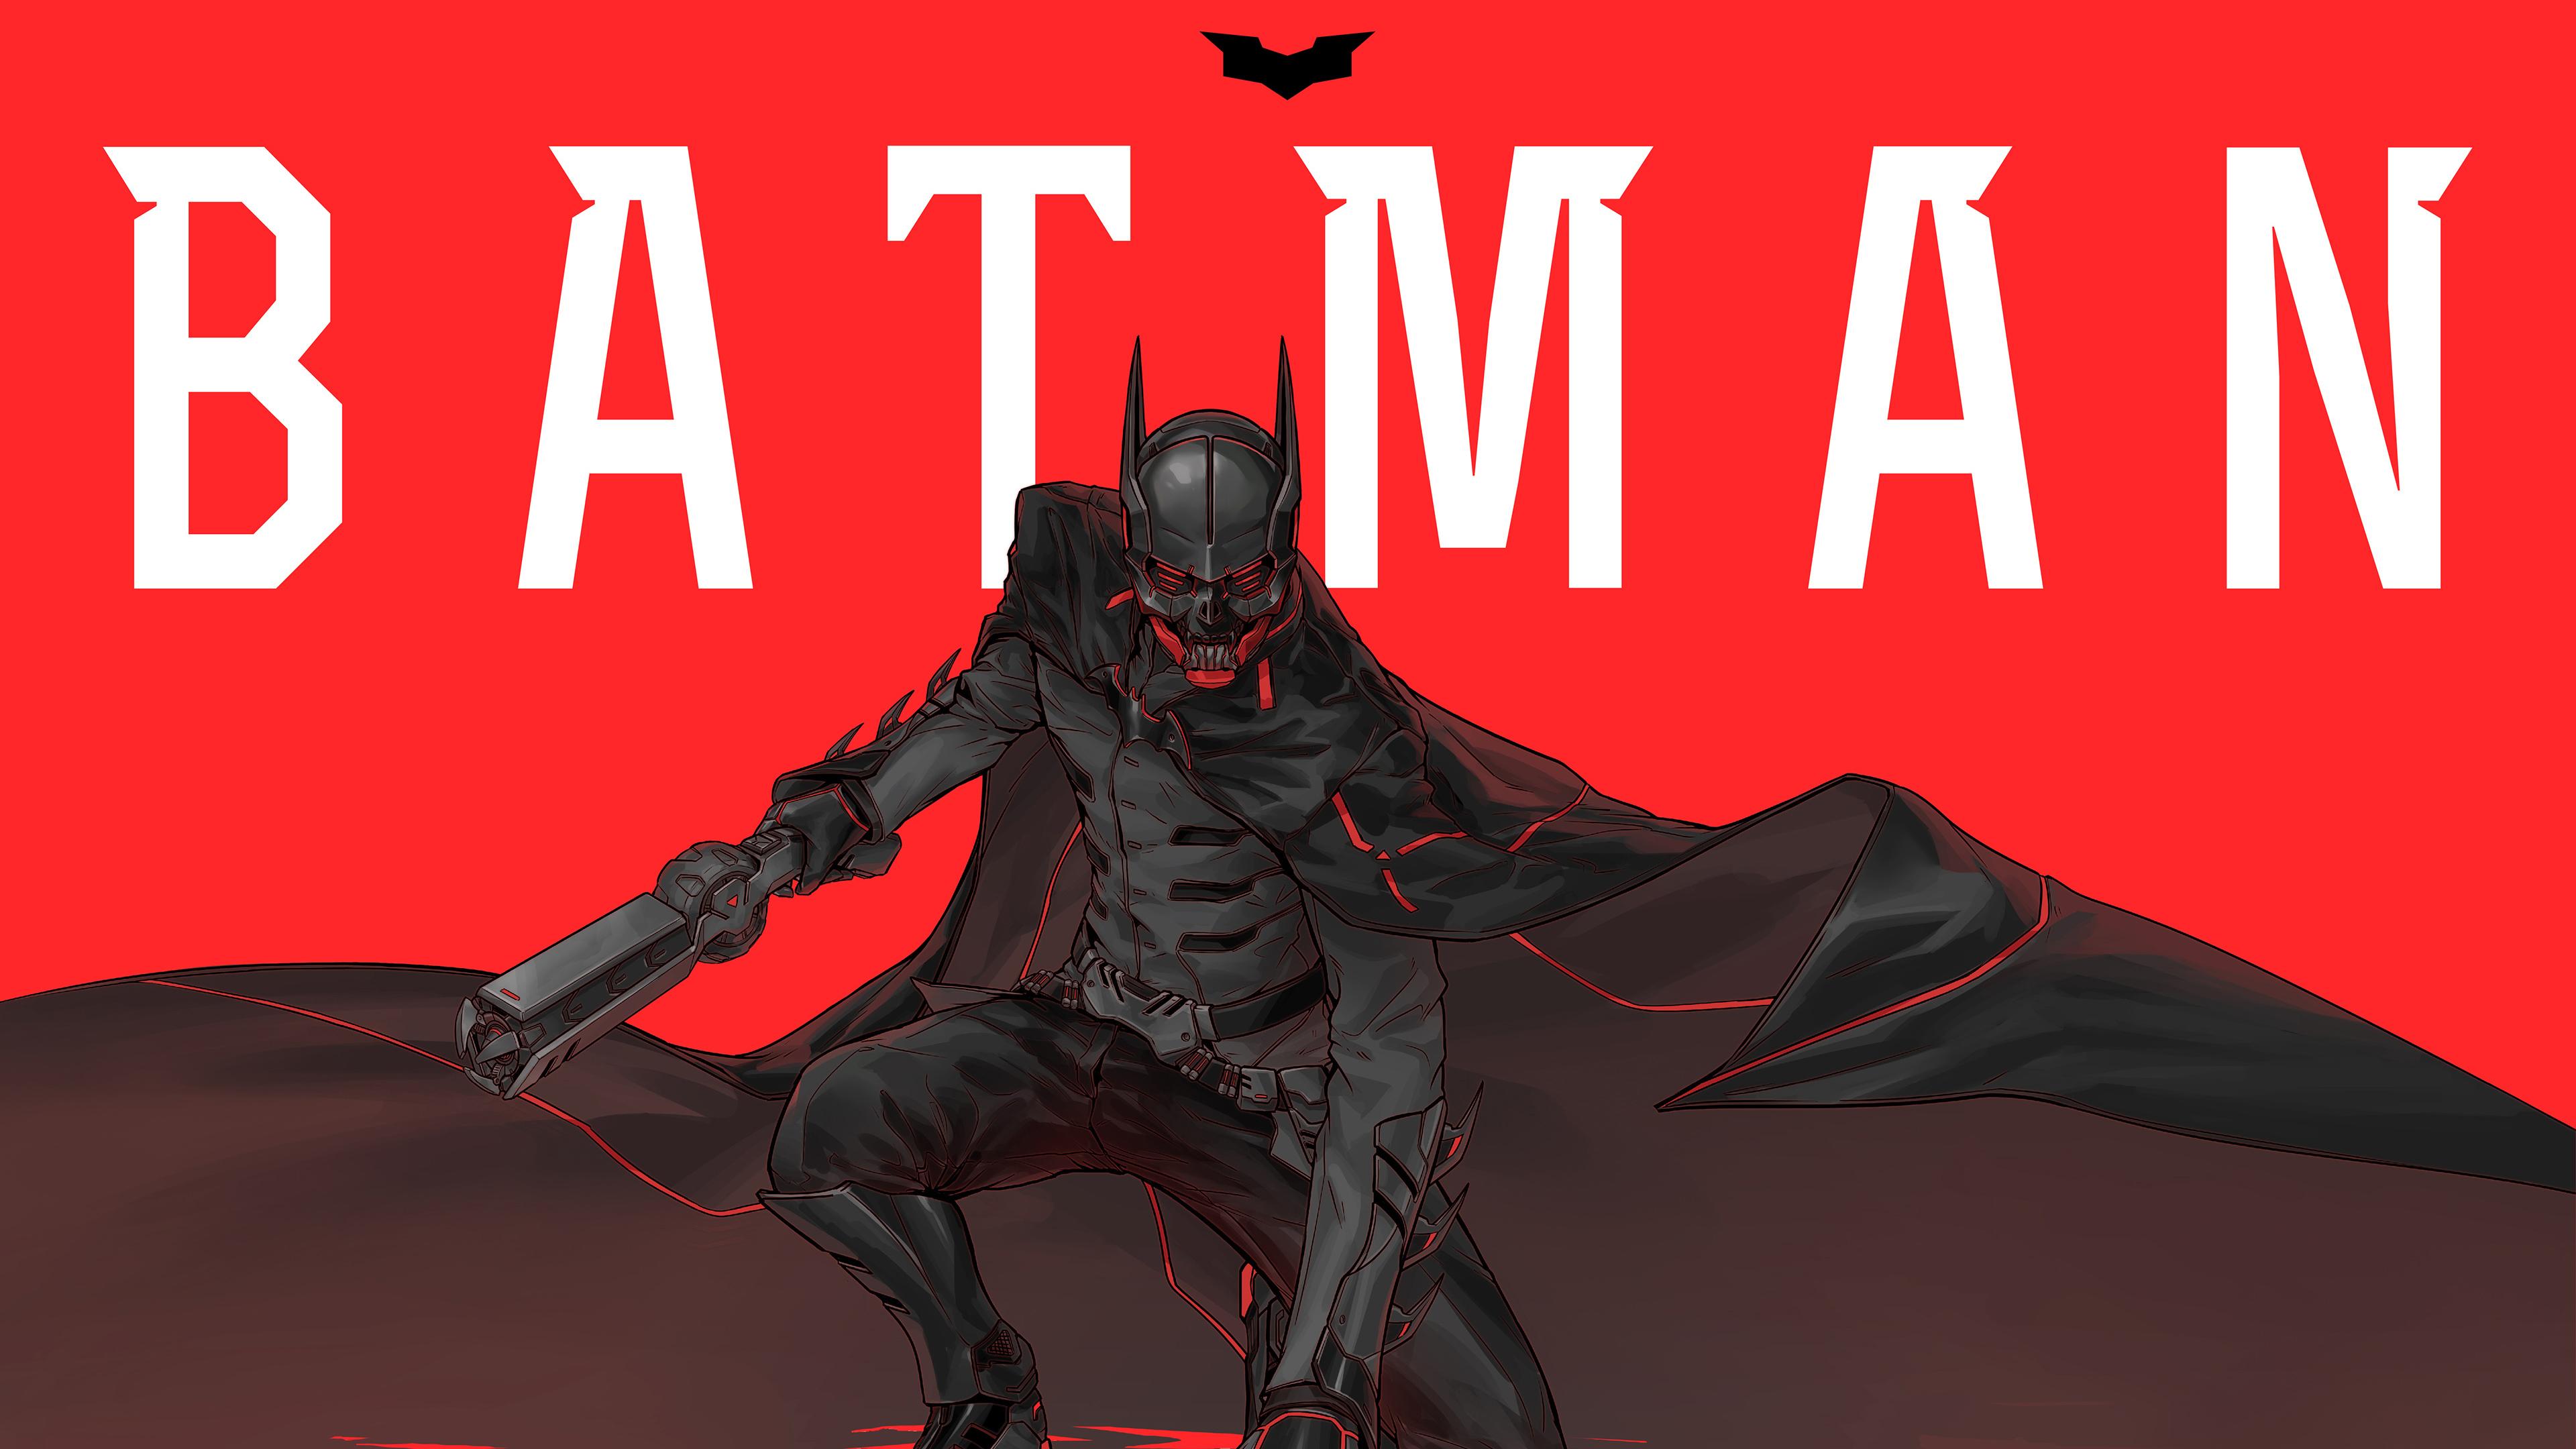 batman cmp 4k 1553071001 - Batman Cmp 4k - superheroes wallpapers, hd-wallpapers, digital art wallpapers, behance wallpapers, batman wallpapers, artwork wallpapers, artist wallpapers, 4k-wallpapers